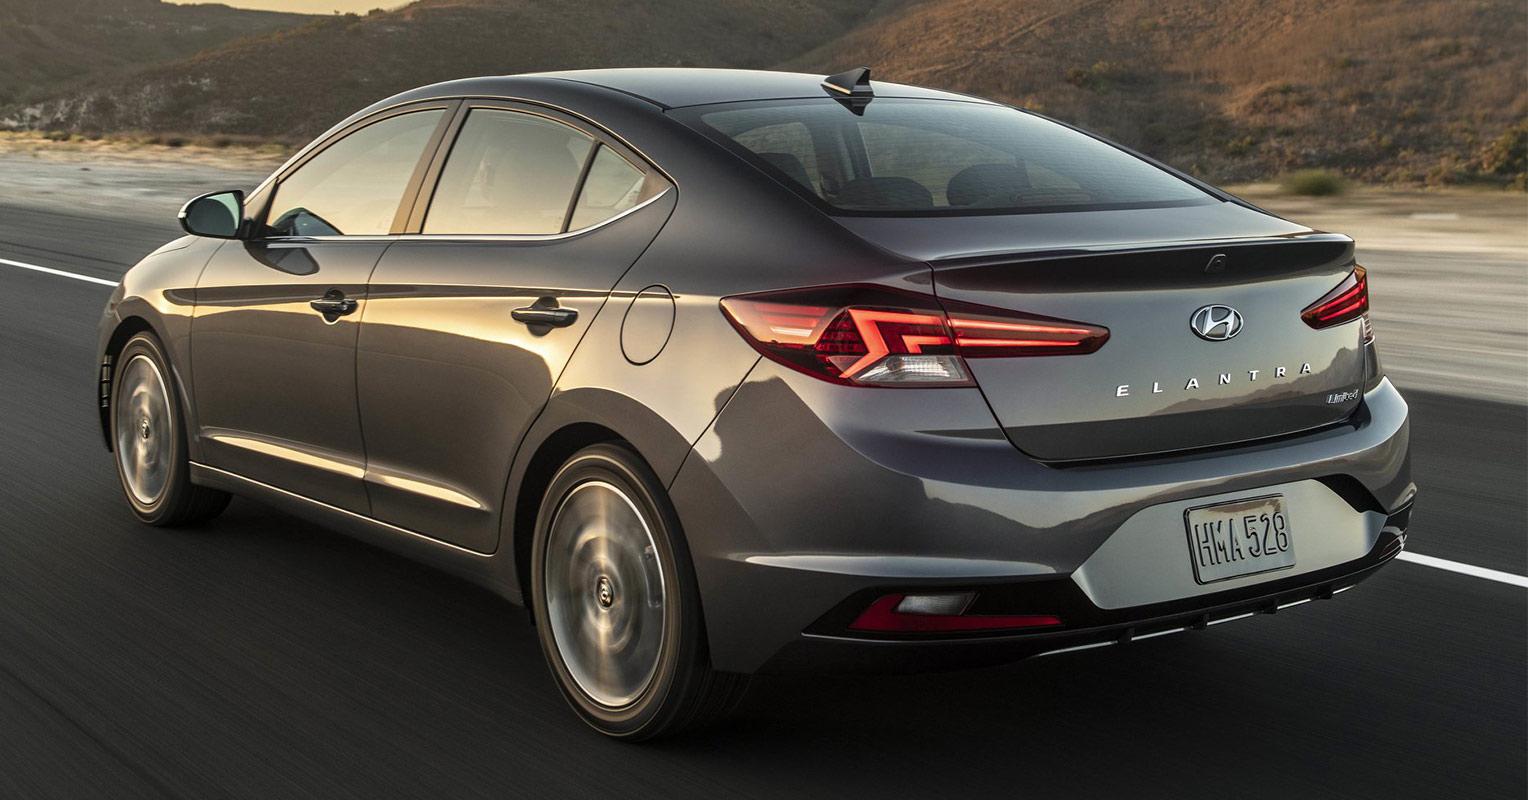 Trasera del Hyundai Elantra 2019